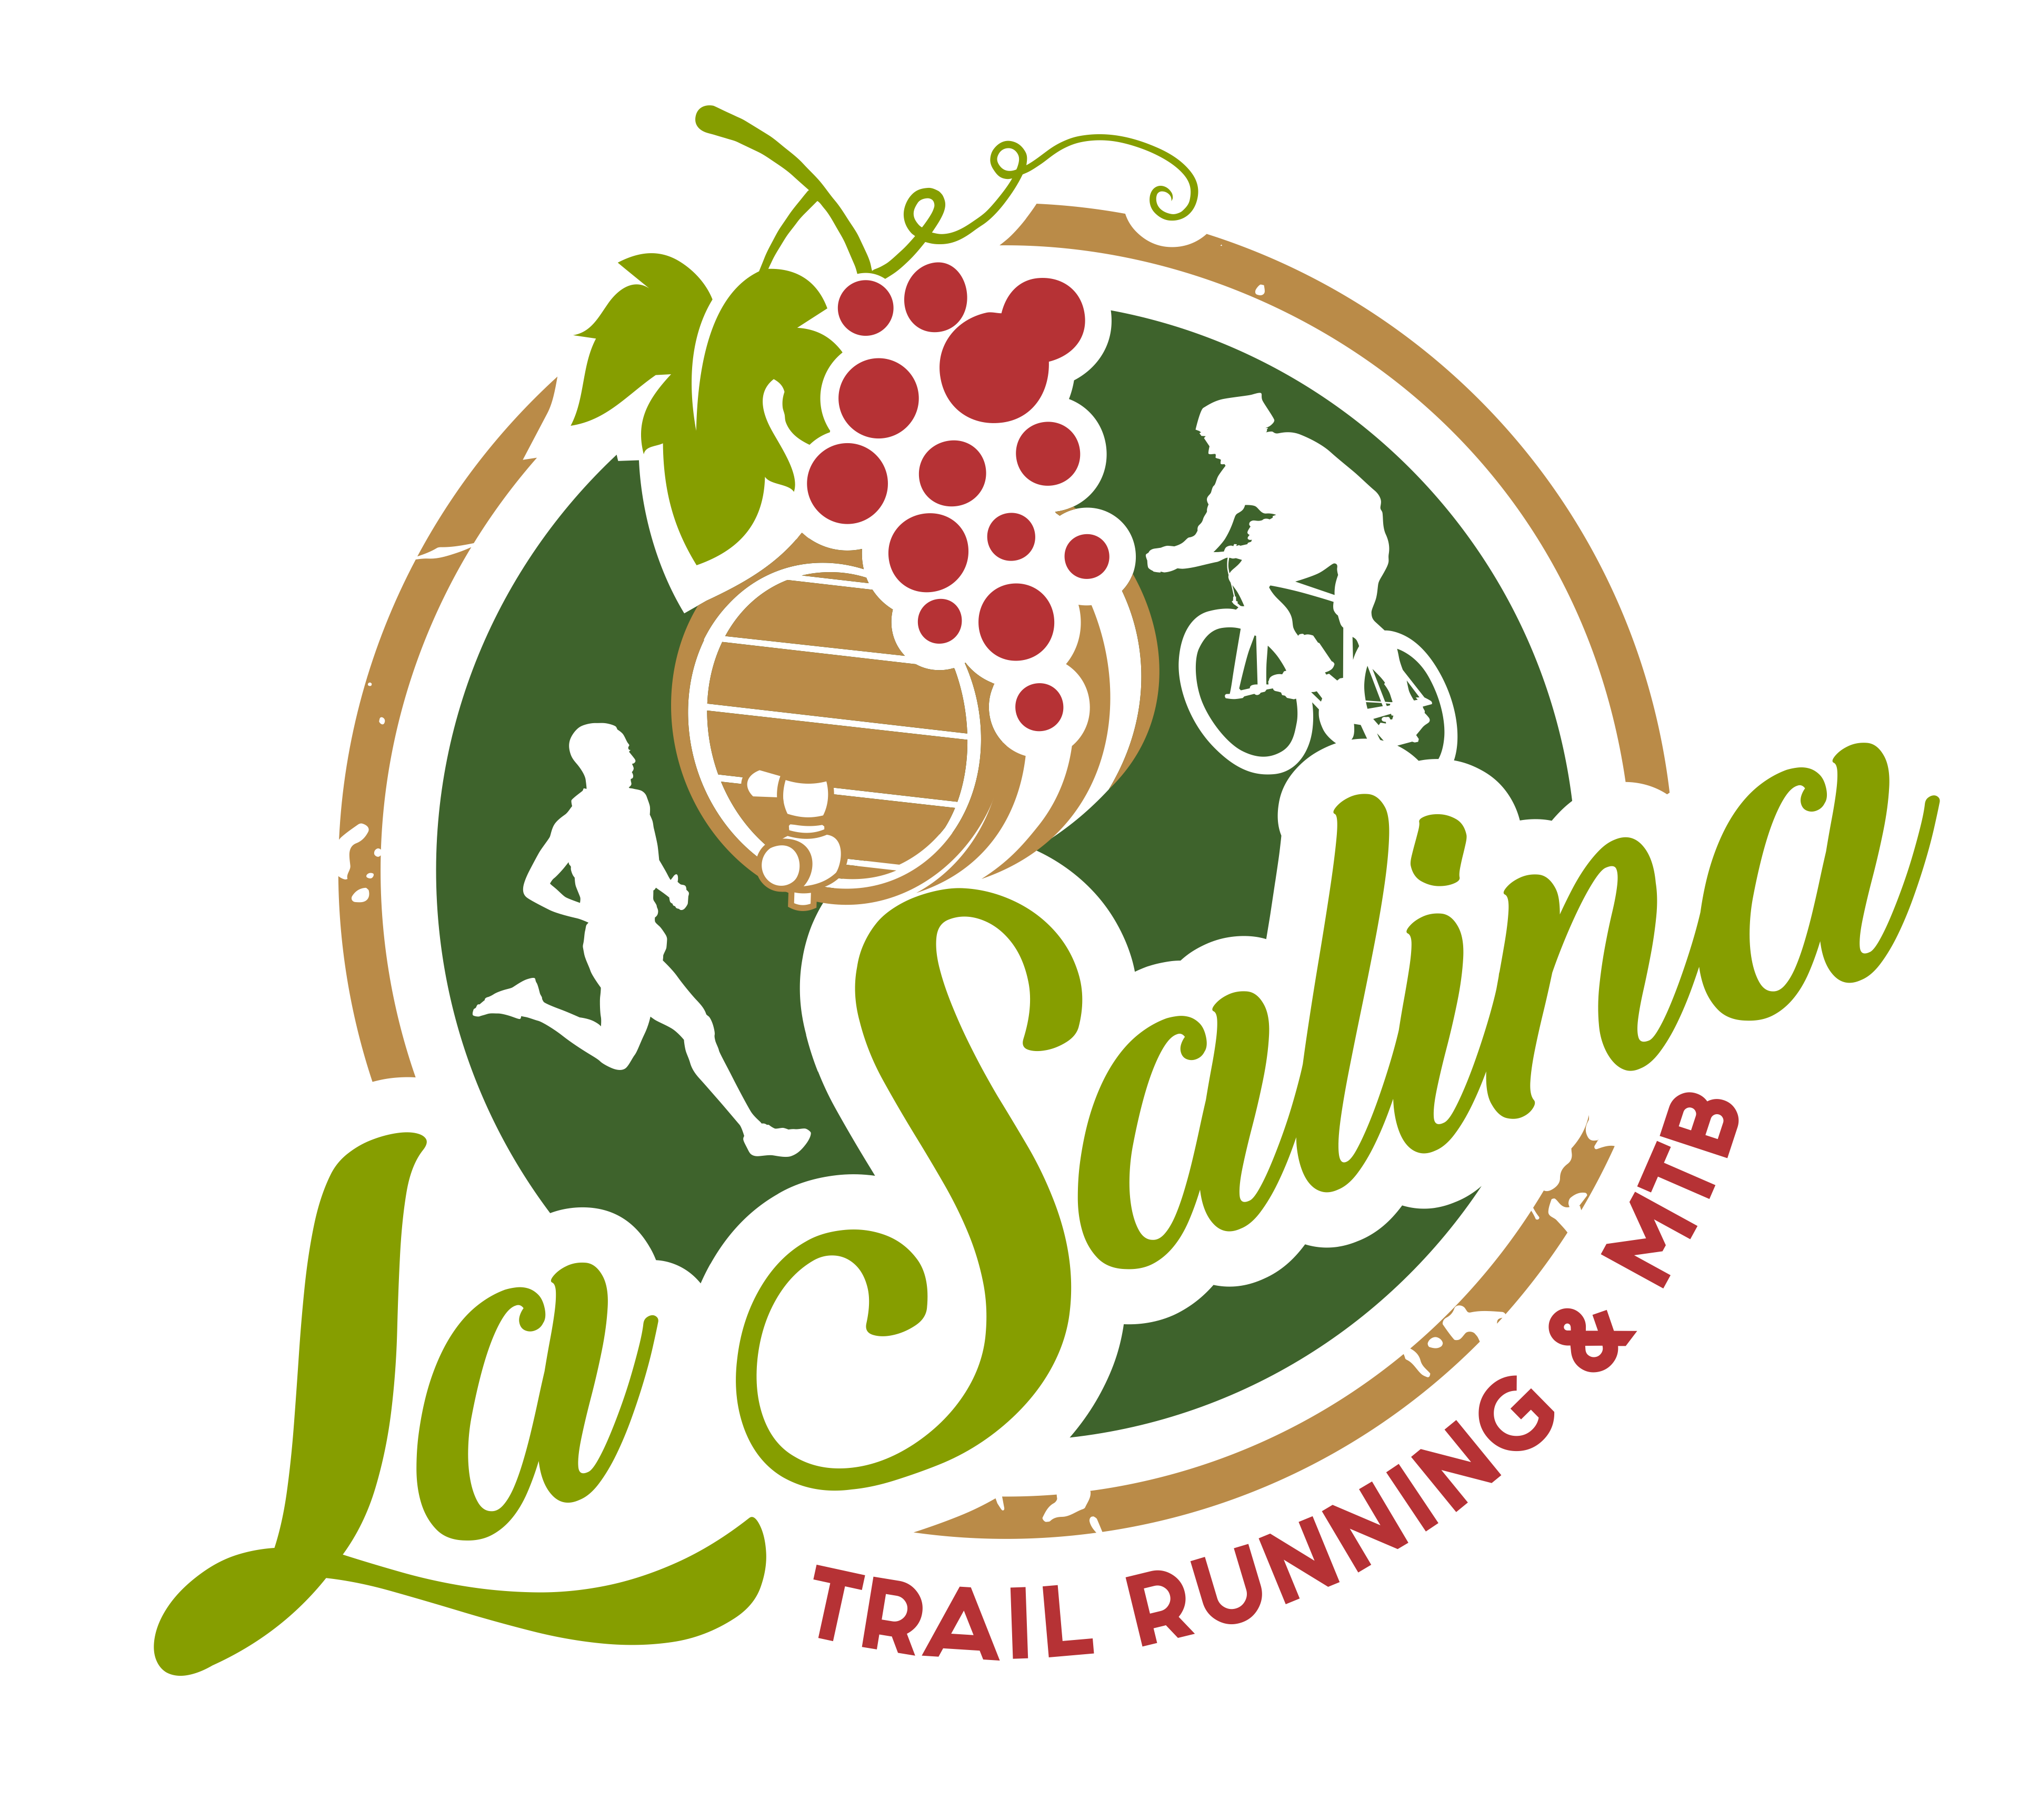 La Salina Race